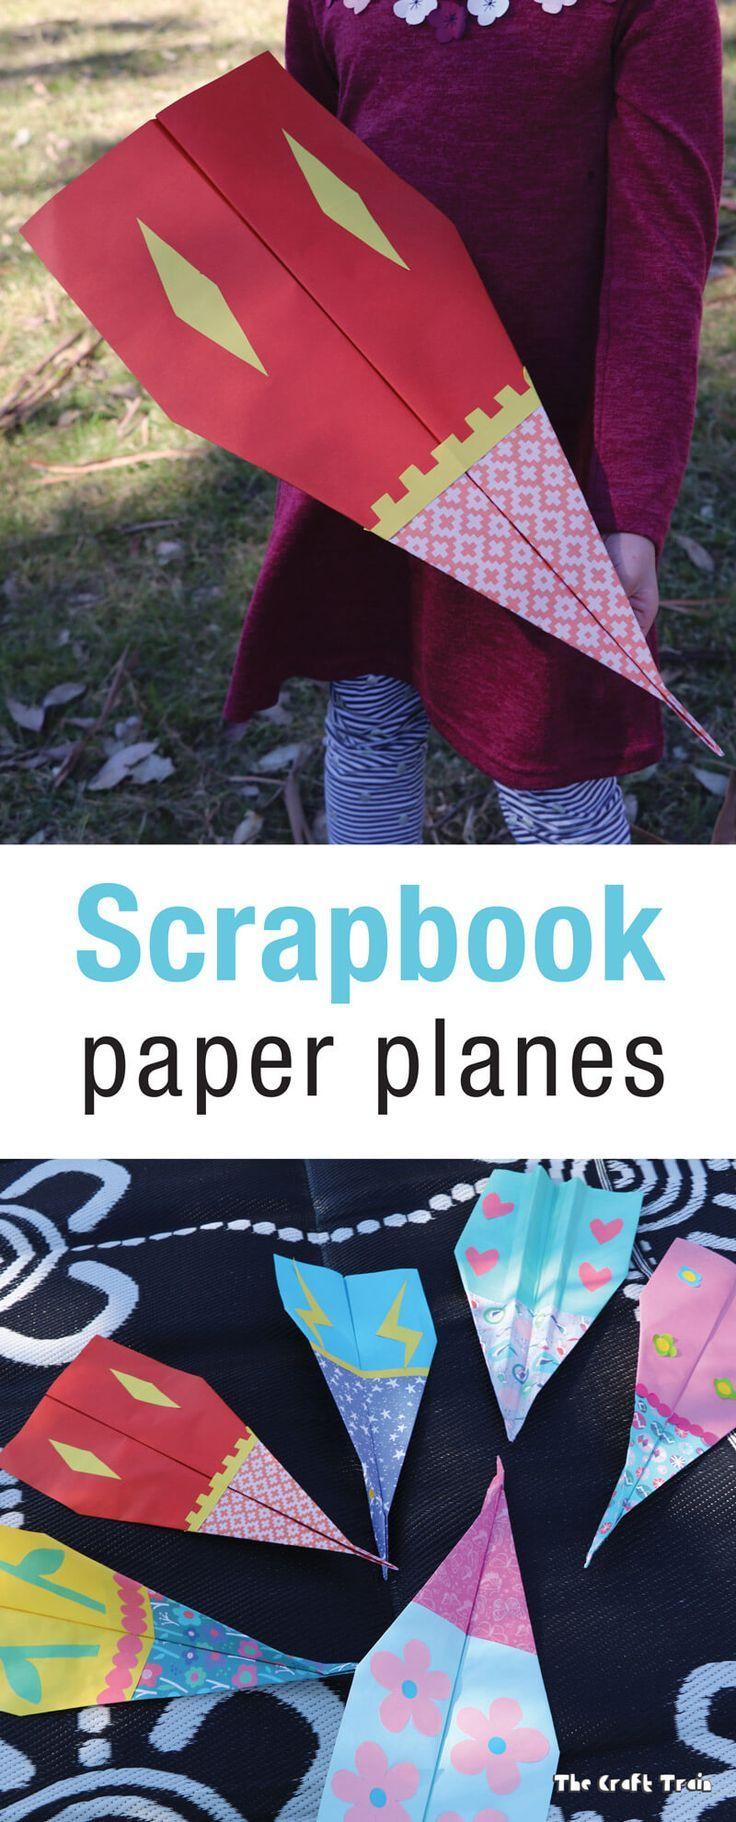 scrapbook paper planes